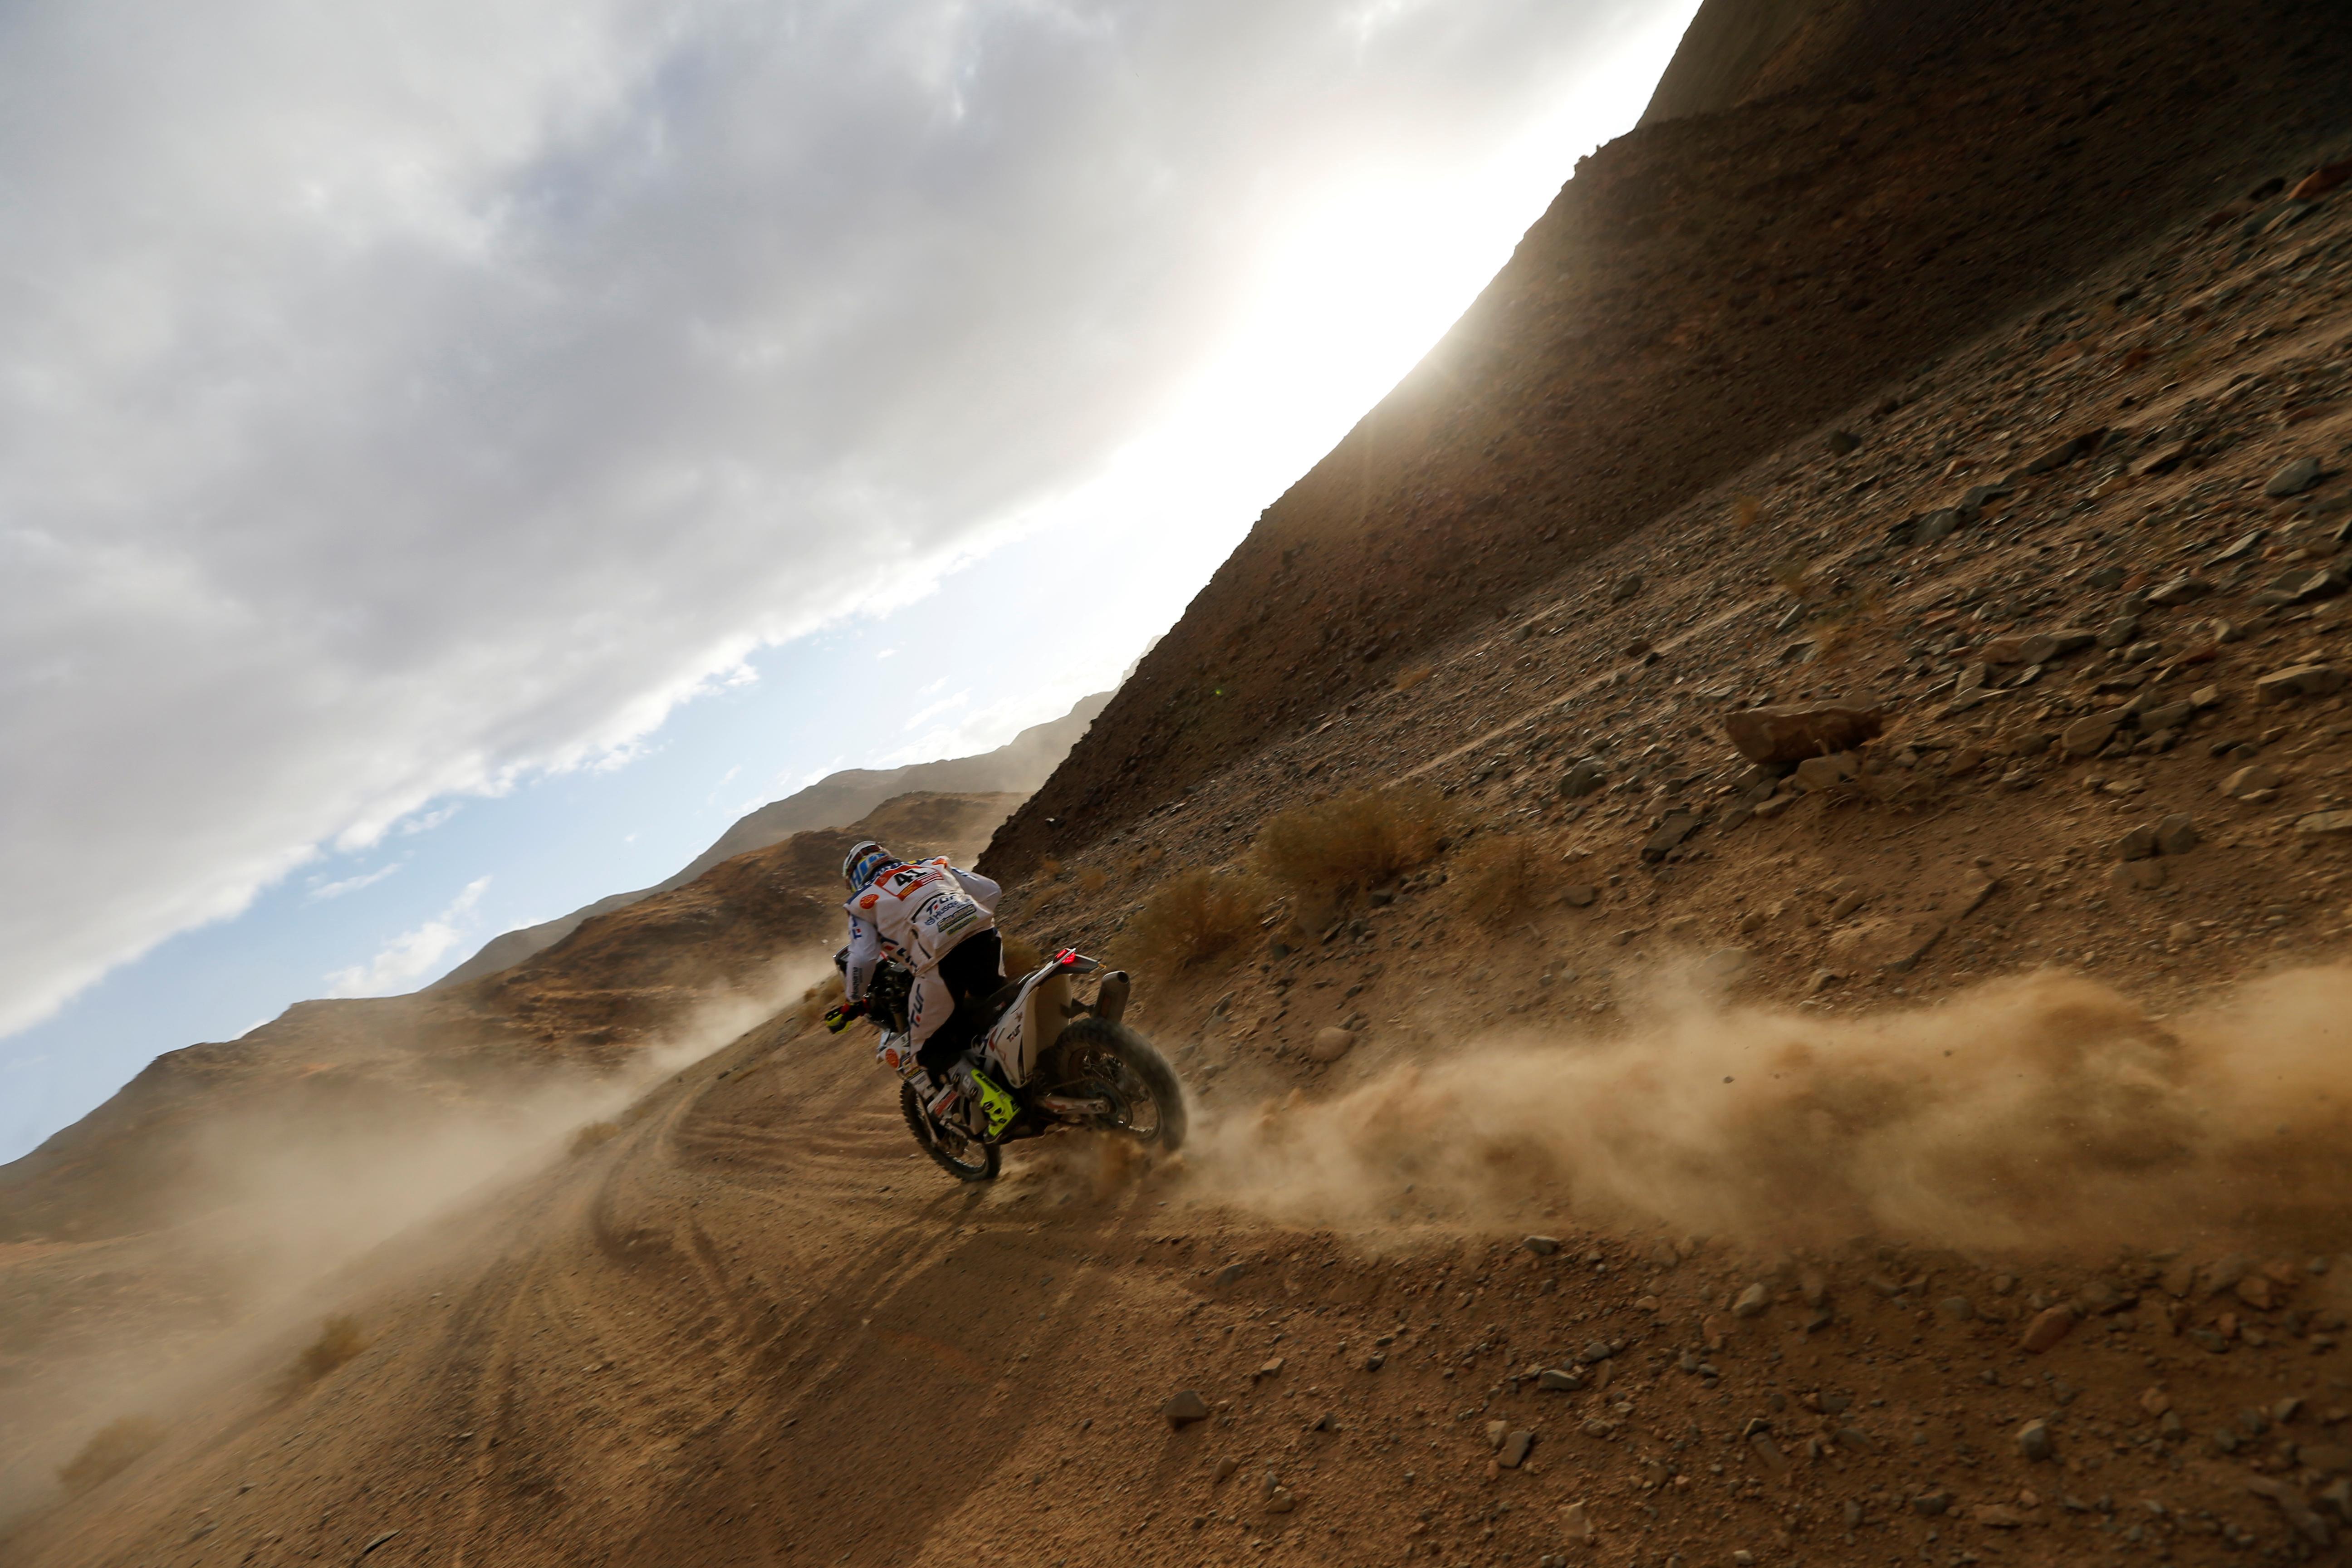 El chileno José Ignacio Cornejo (Honda) se hizo con la primera plaza en la jornada en motos